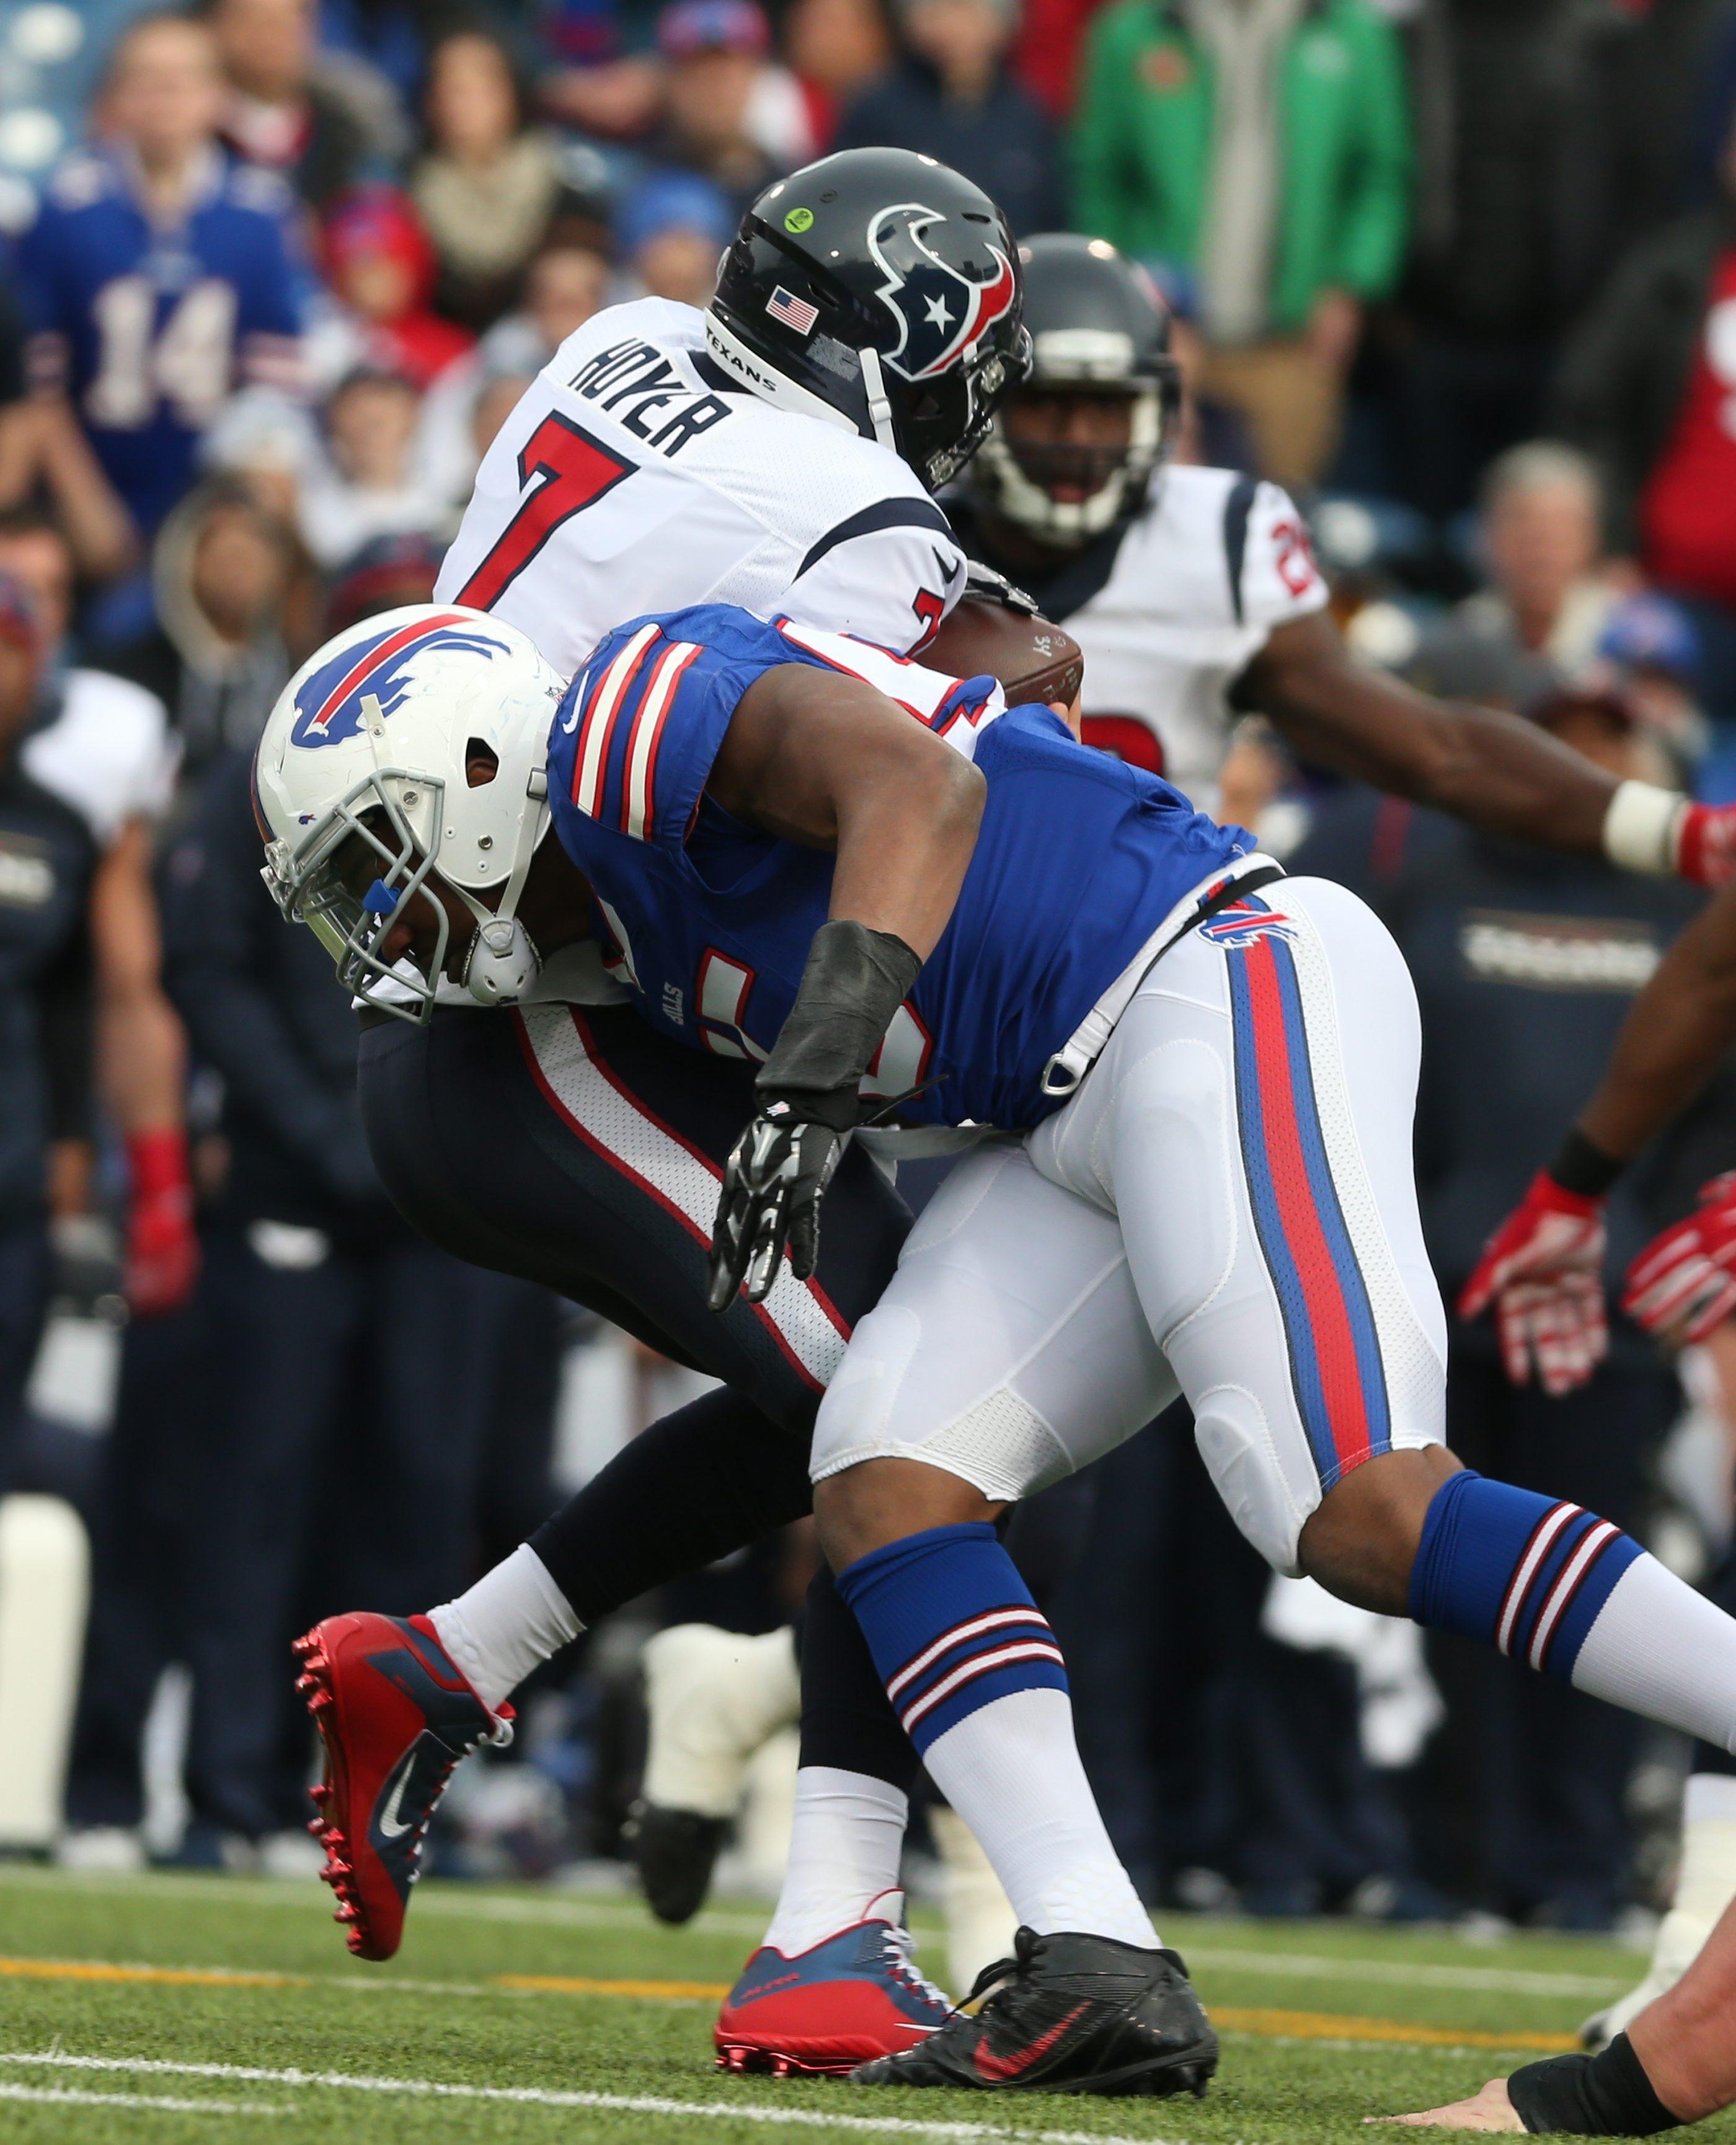 Bills defensive end Jerry Hughes didn't jump the gun when he sacked Texans quarterback Brian Hoyer during Buffalo's win on Dec. 6.